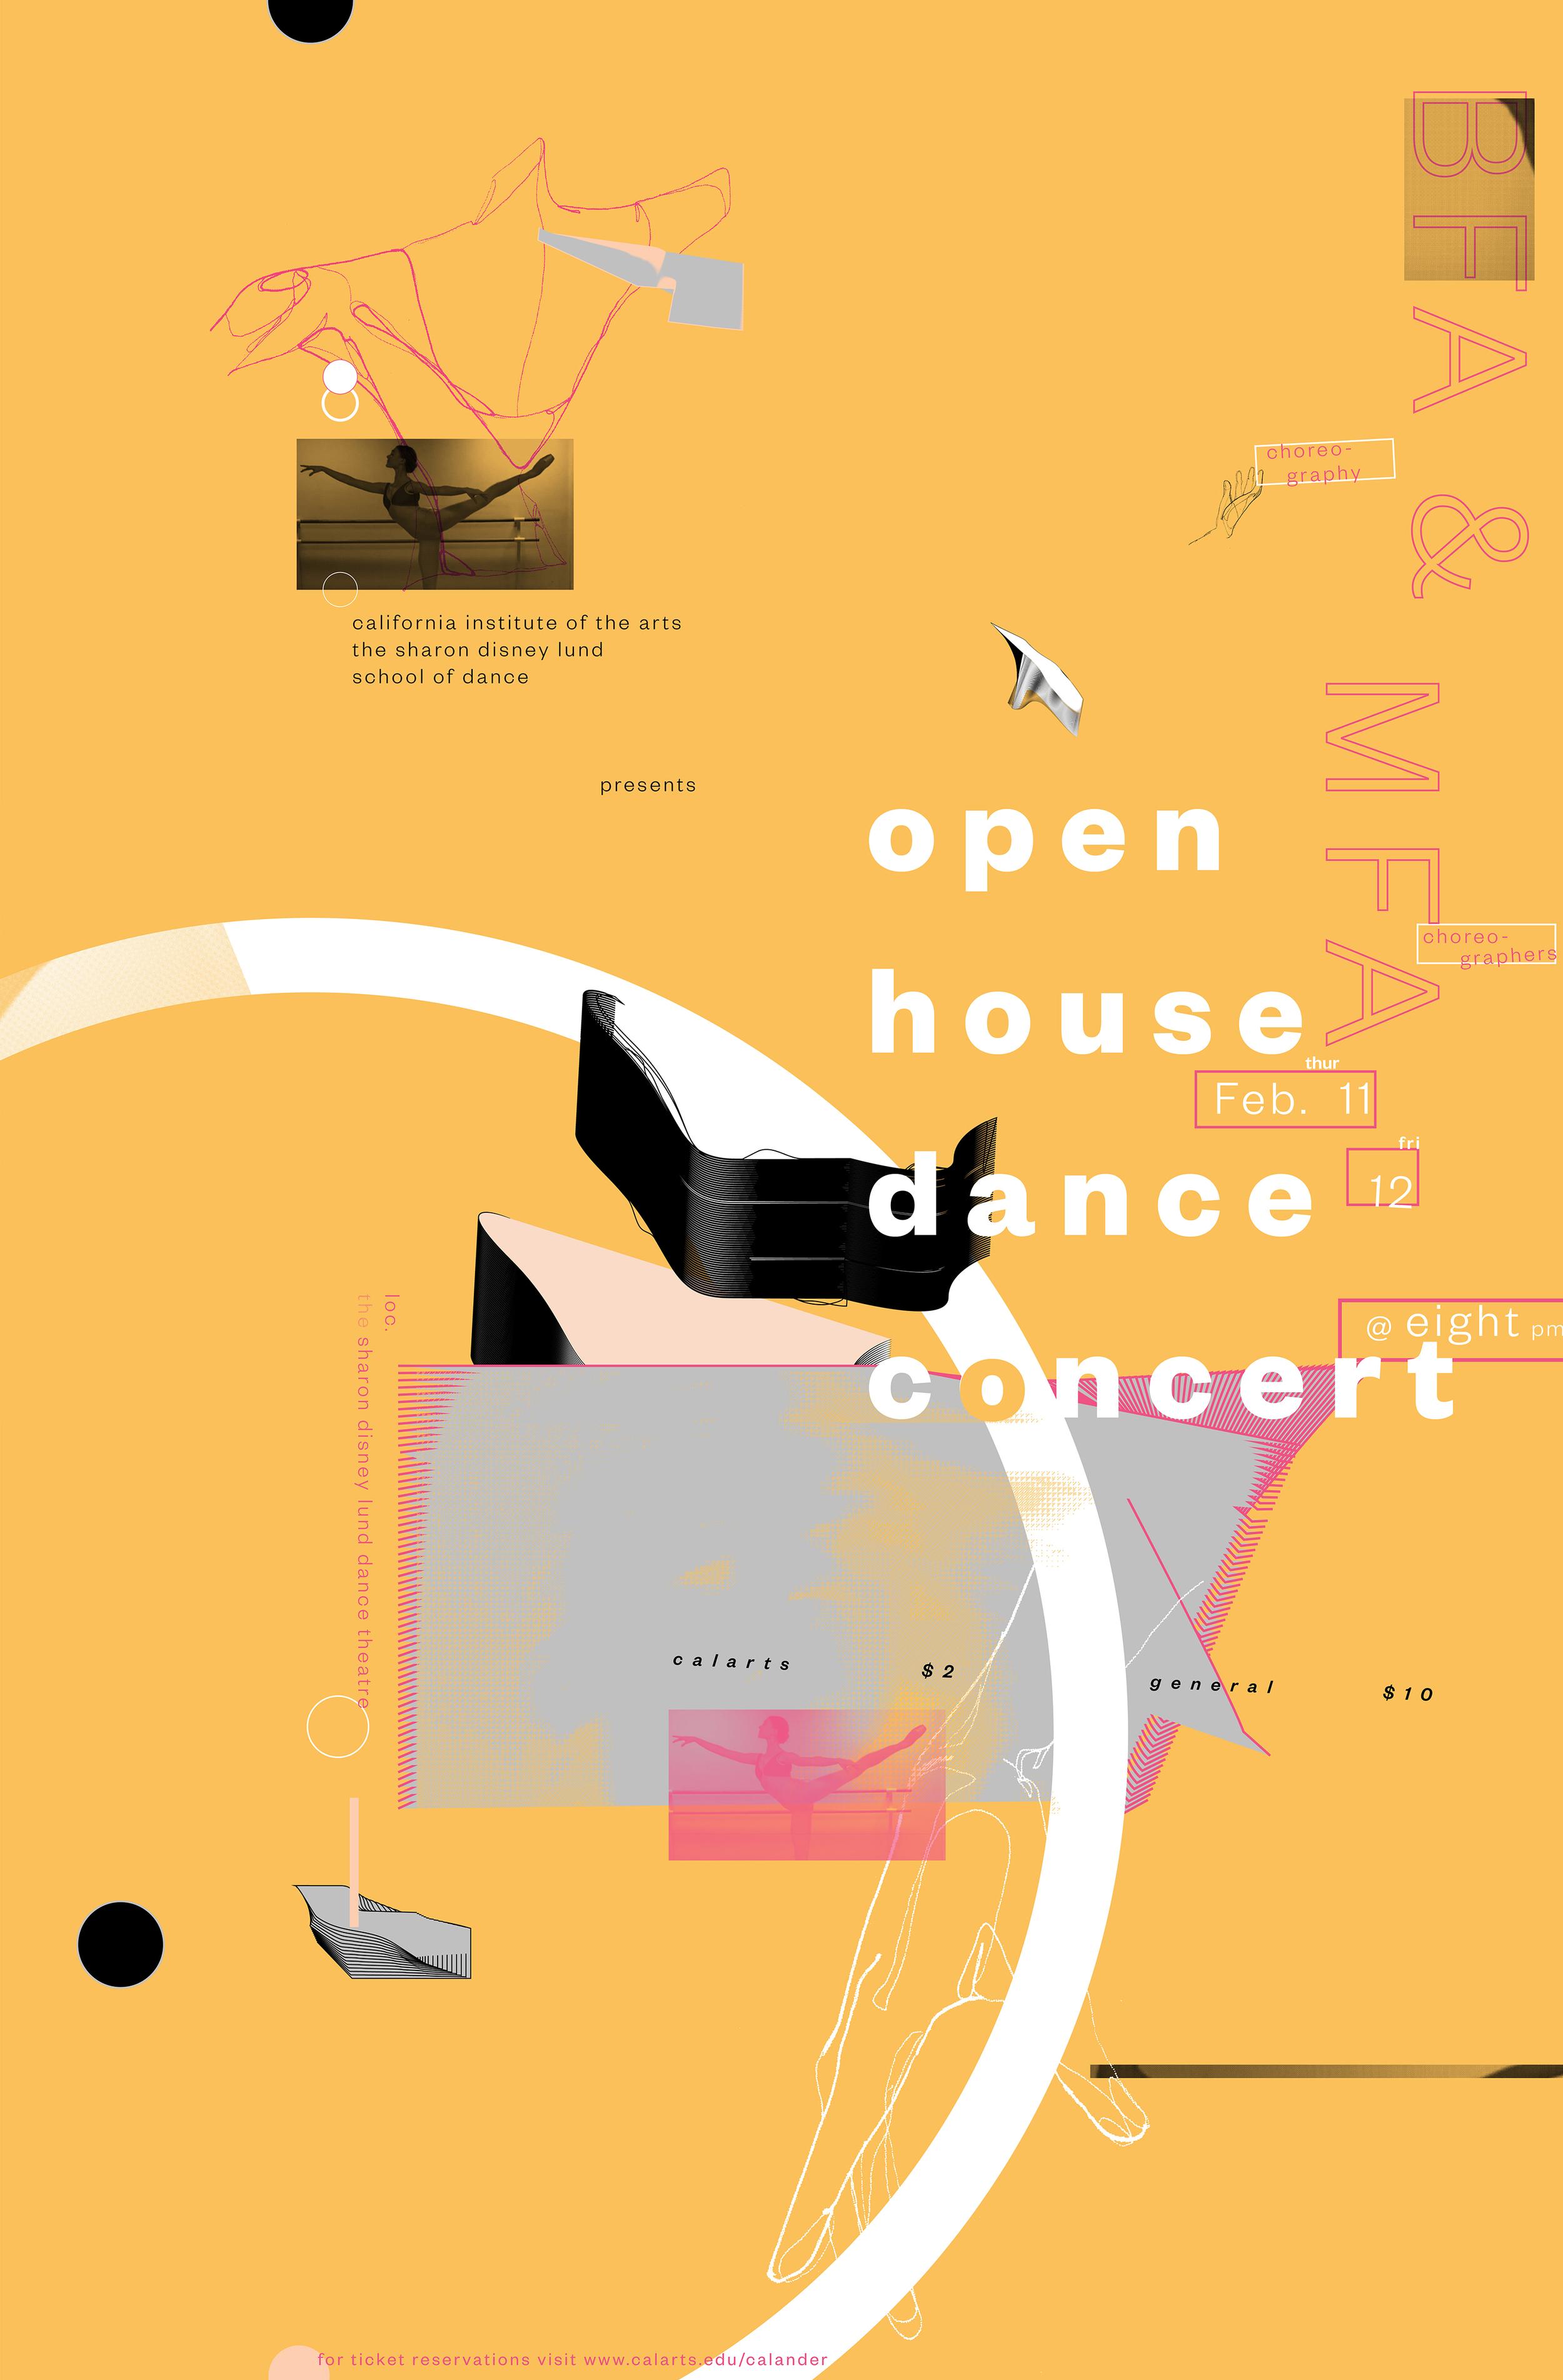 Open house dance sqrspc.jpg